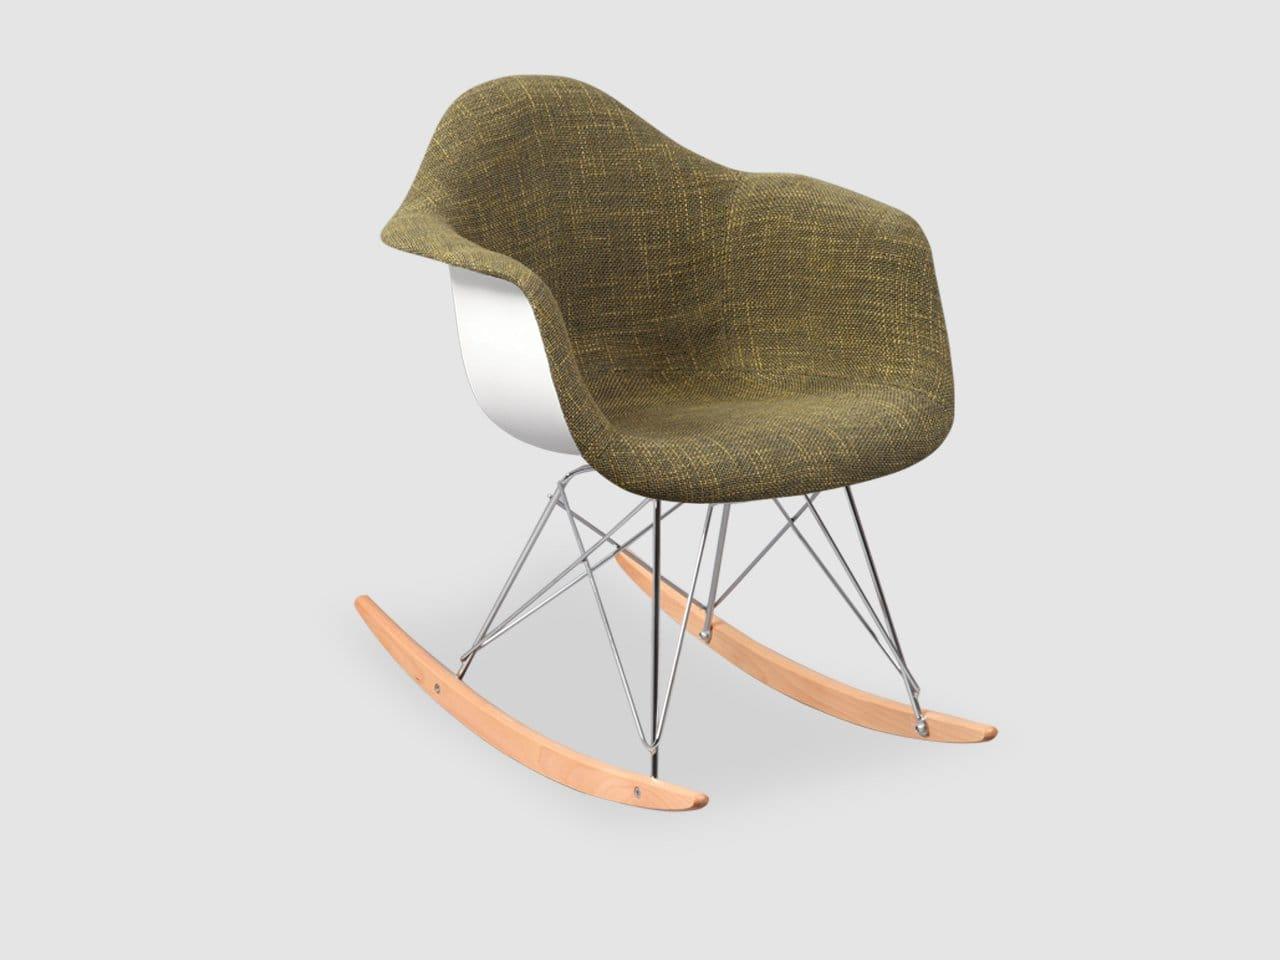 rocker chair sg beach chairs walgreens gum  half fabric 43 rocking arm comfort design